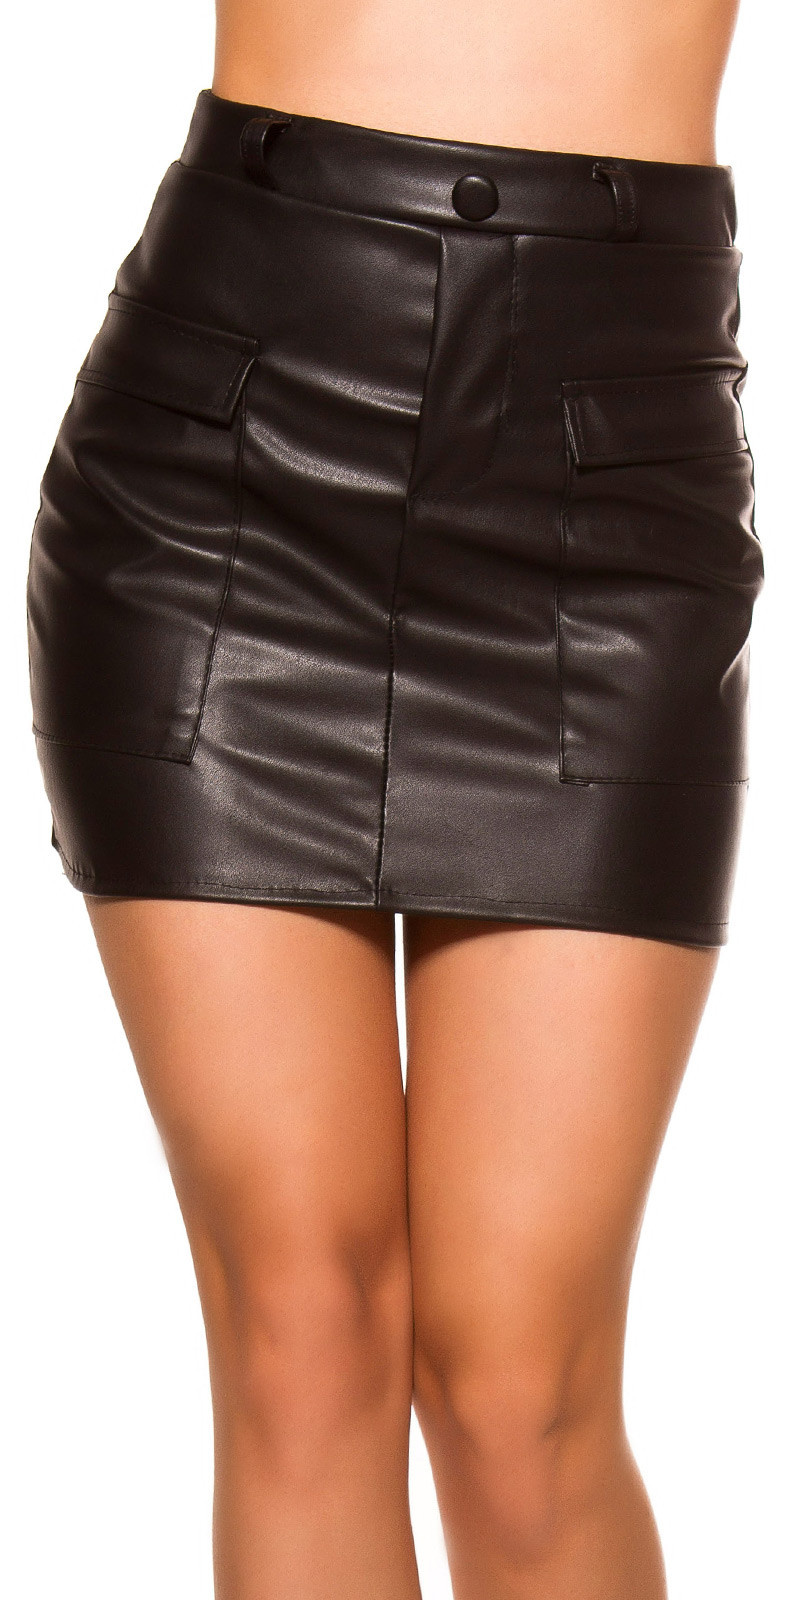 Sexy leatherlook mini skirt with pockets Black